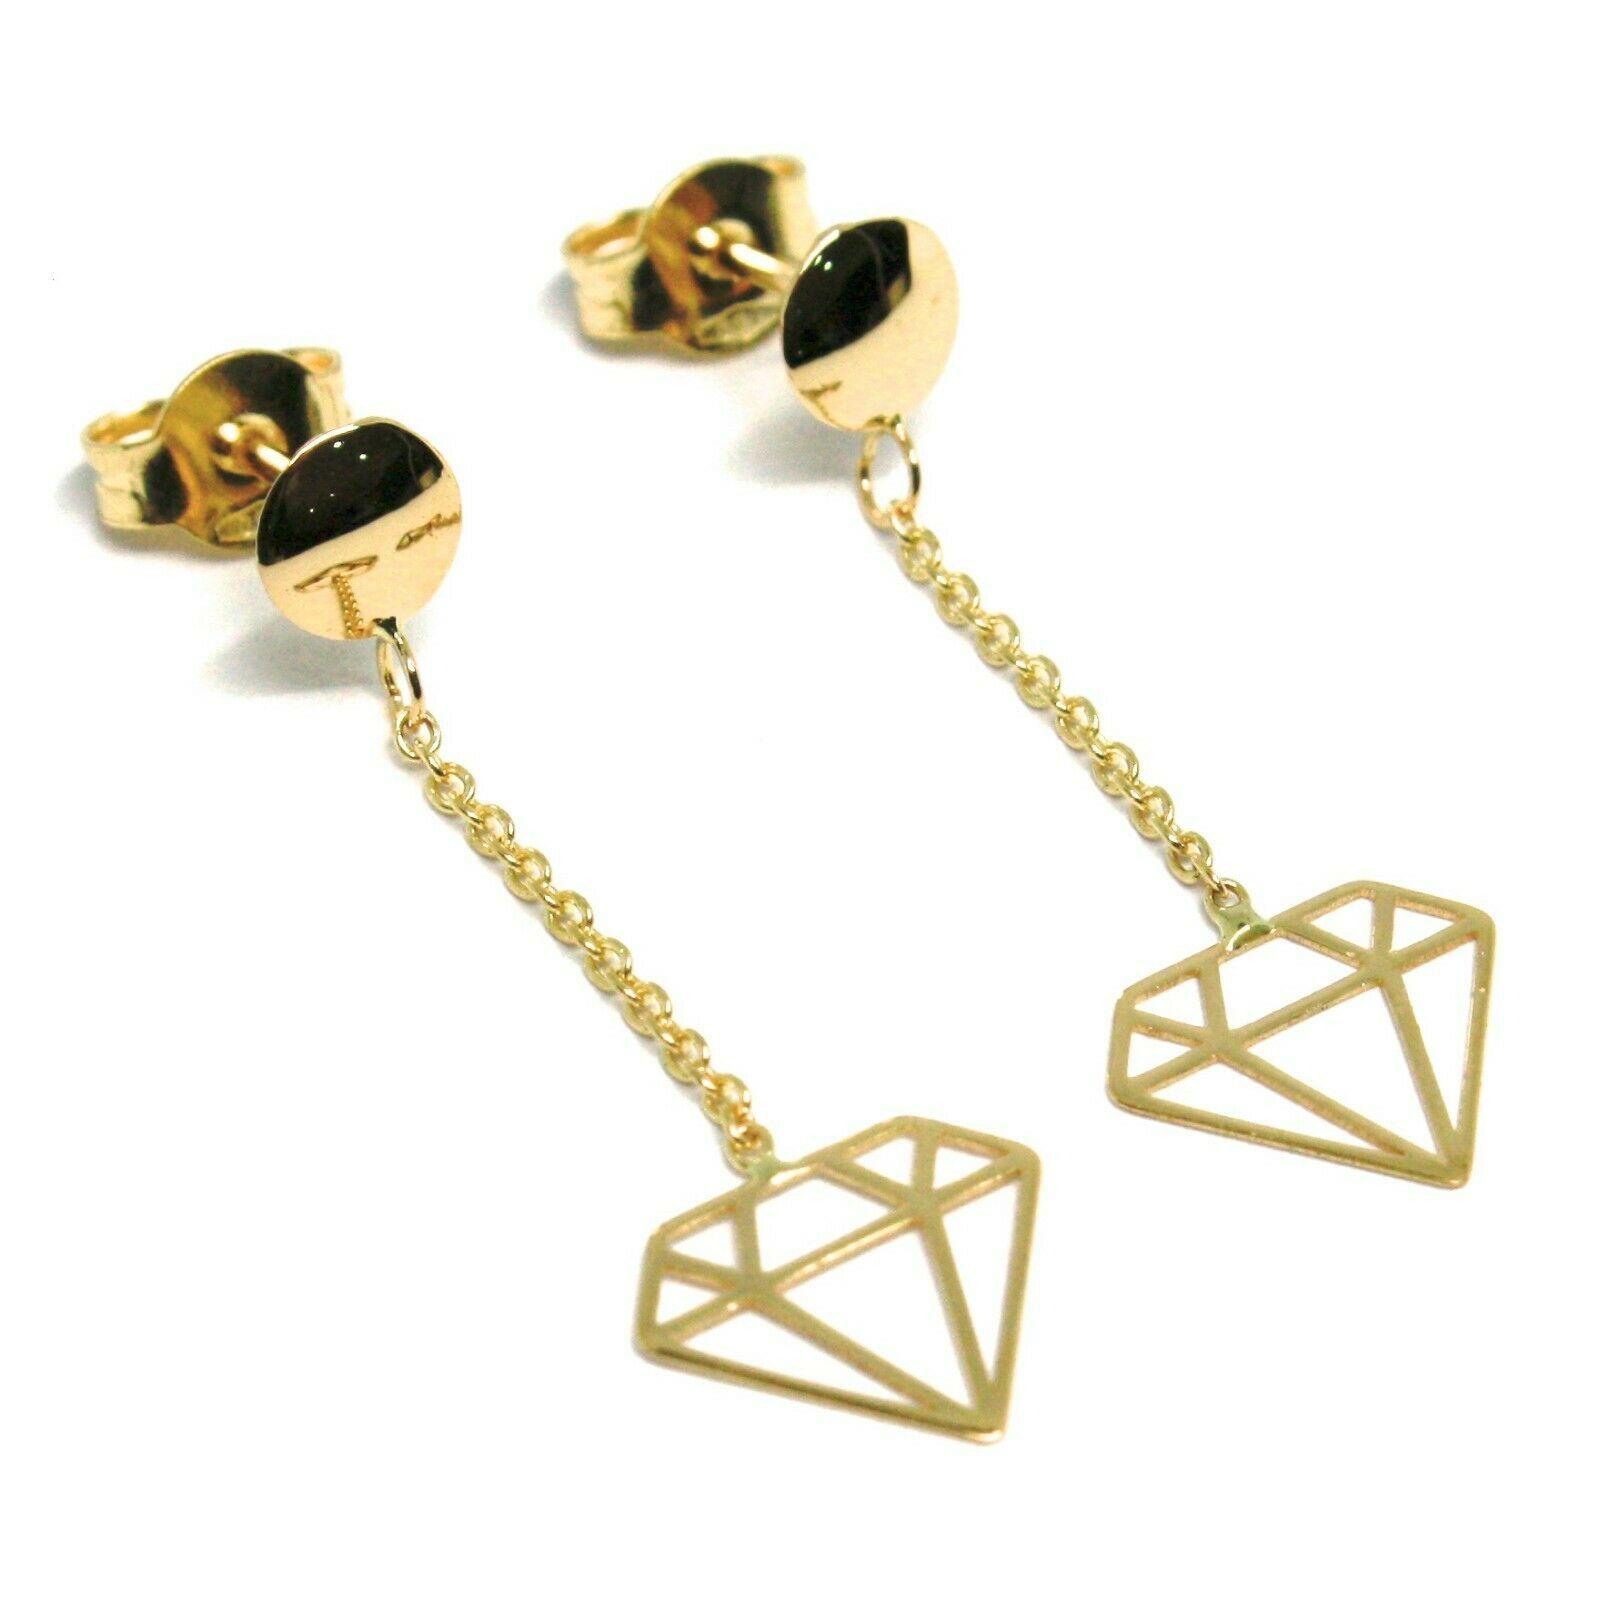 18K YELLOW GOLD PENDANT EARRINGS, OPENWORK FLAT DIAMONDS, BUTTERFLY CLOSURE